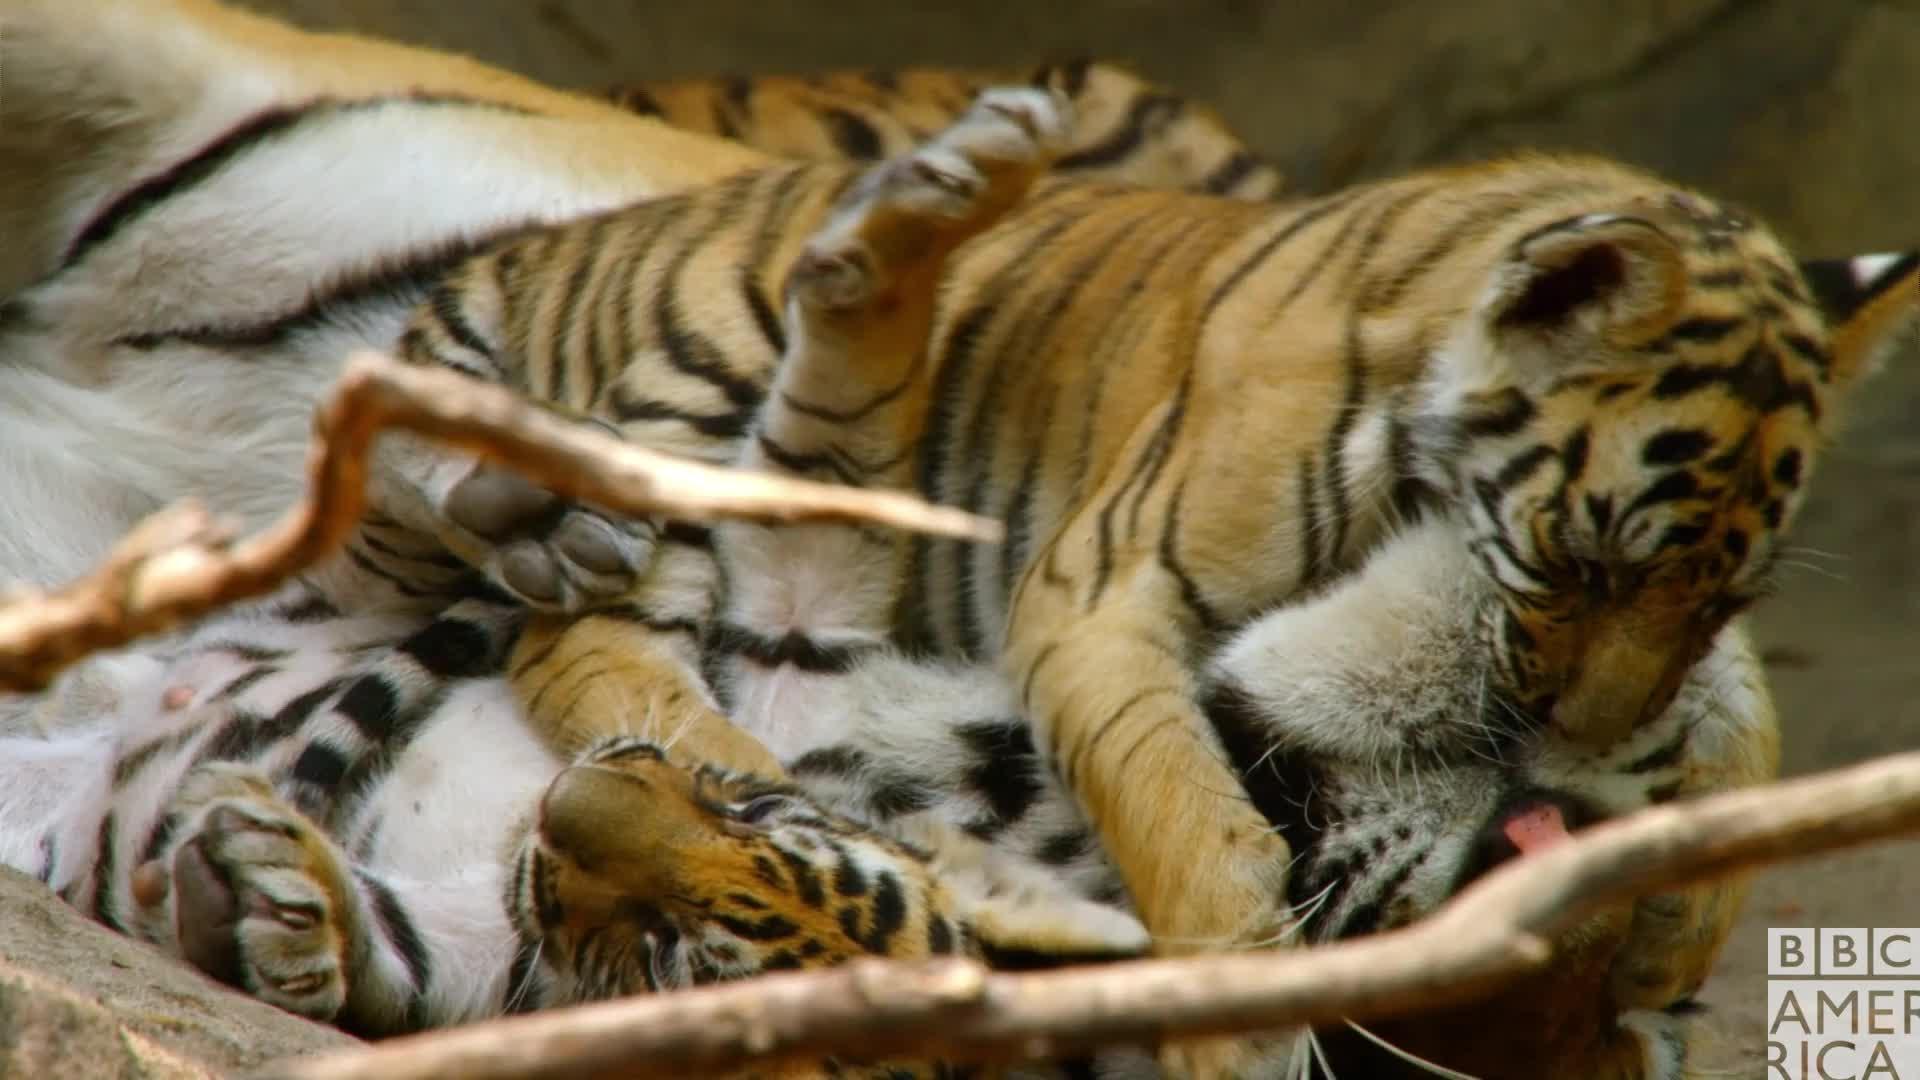 animal, animals, awww, bbc america, bbc america dynasties, bbc america: dynasties, dynasties, hug, hugs, love, tiger, tigers, Dynasties Tiger Hug GIFs